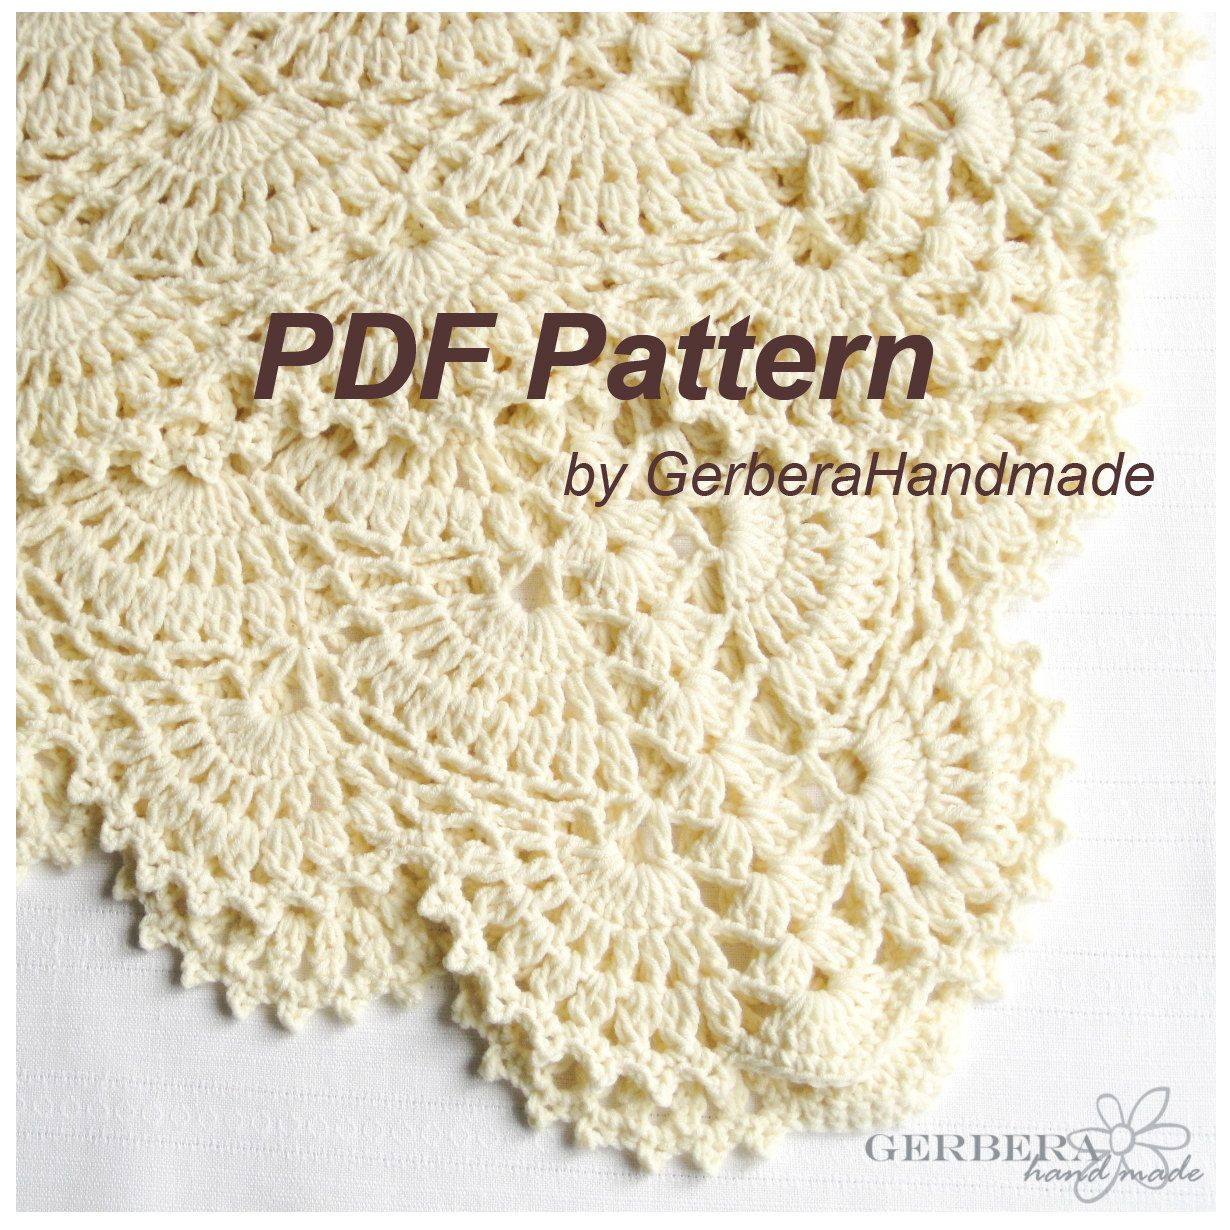 Crochet Pattern Baby Blanket, Tutorial Crochet PDF Creame Baby ...